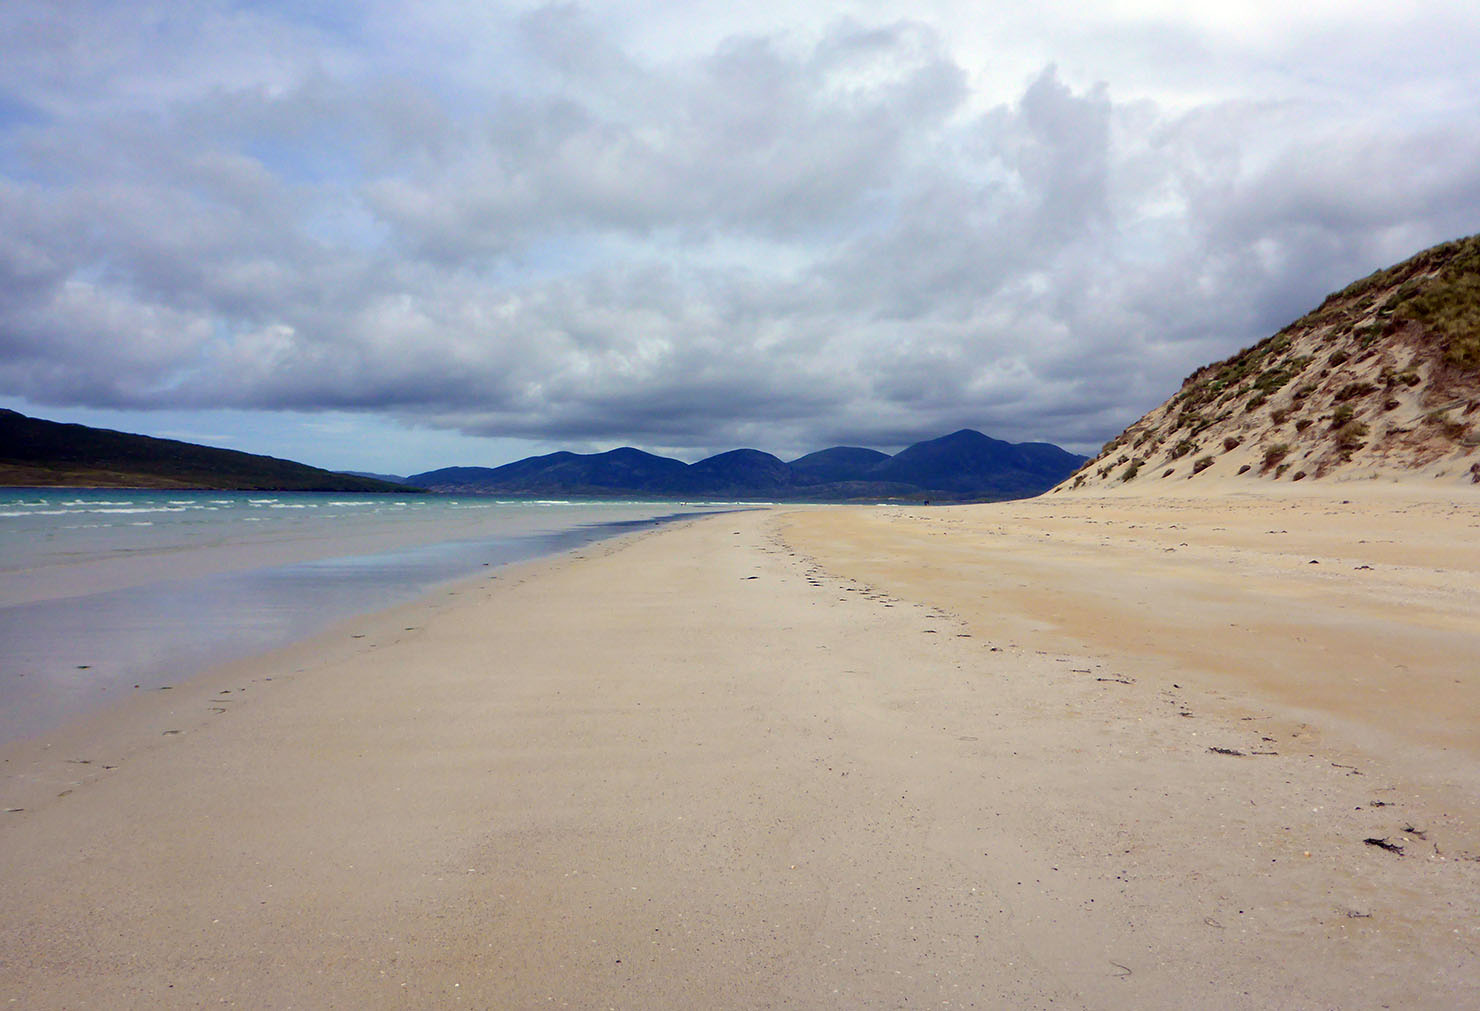 100 Harris hills from Luskentyre beach